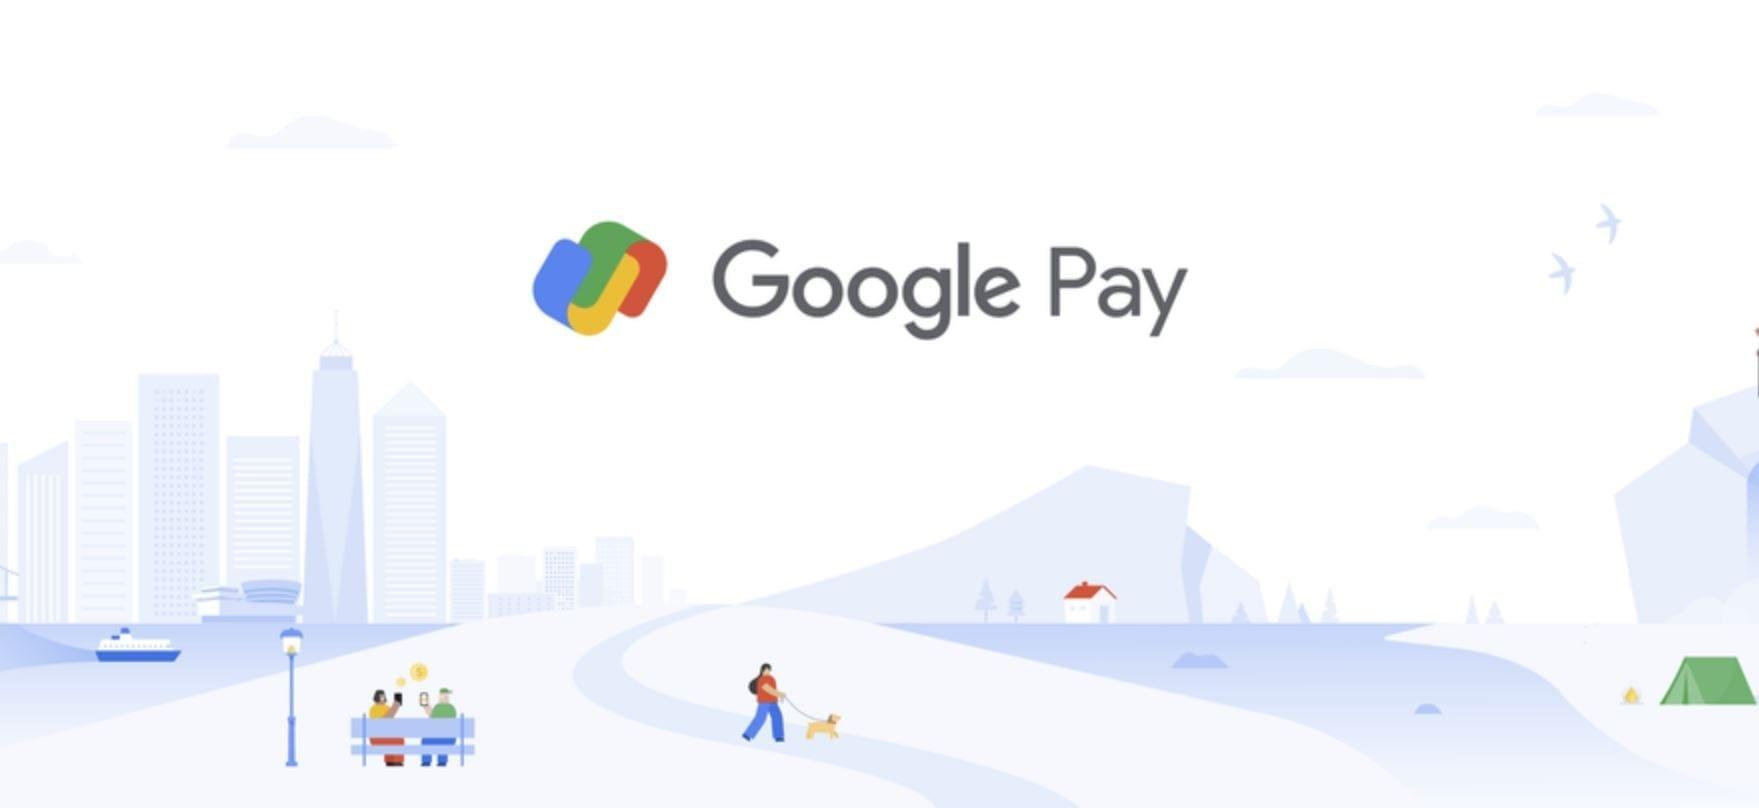 Google Pay è morto, lunga vita al nuovo Google Pay